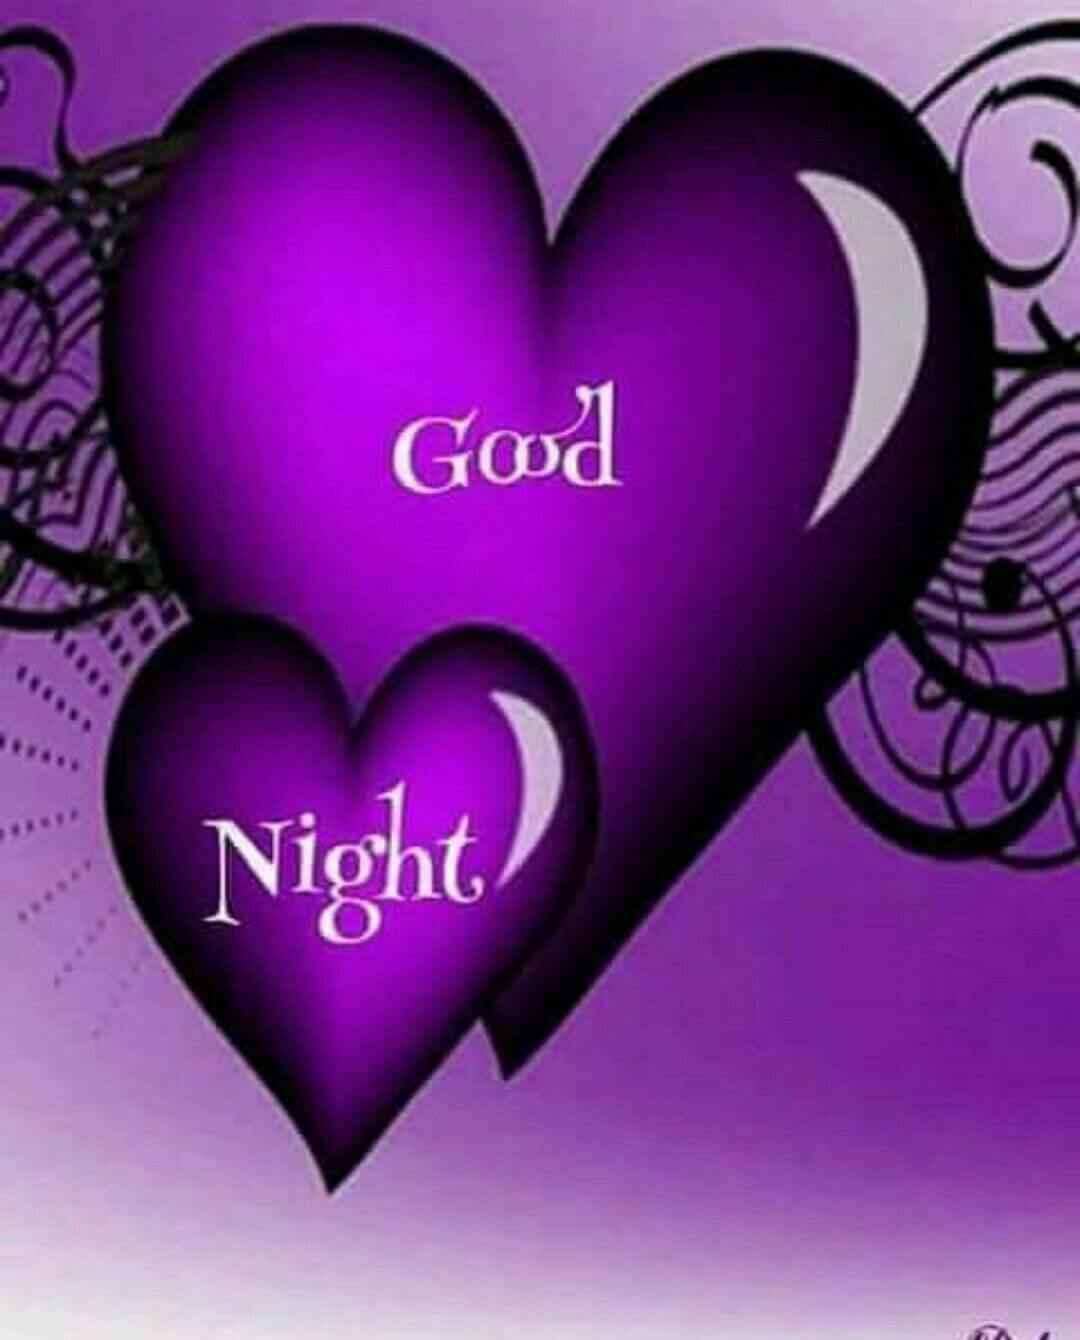 good night love images hd